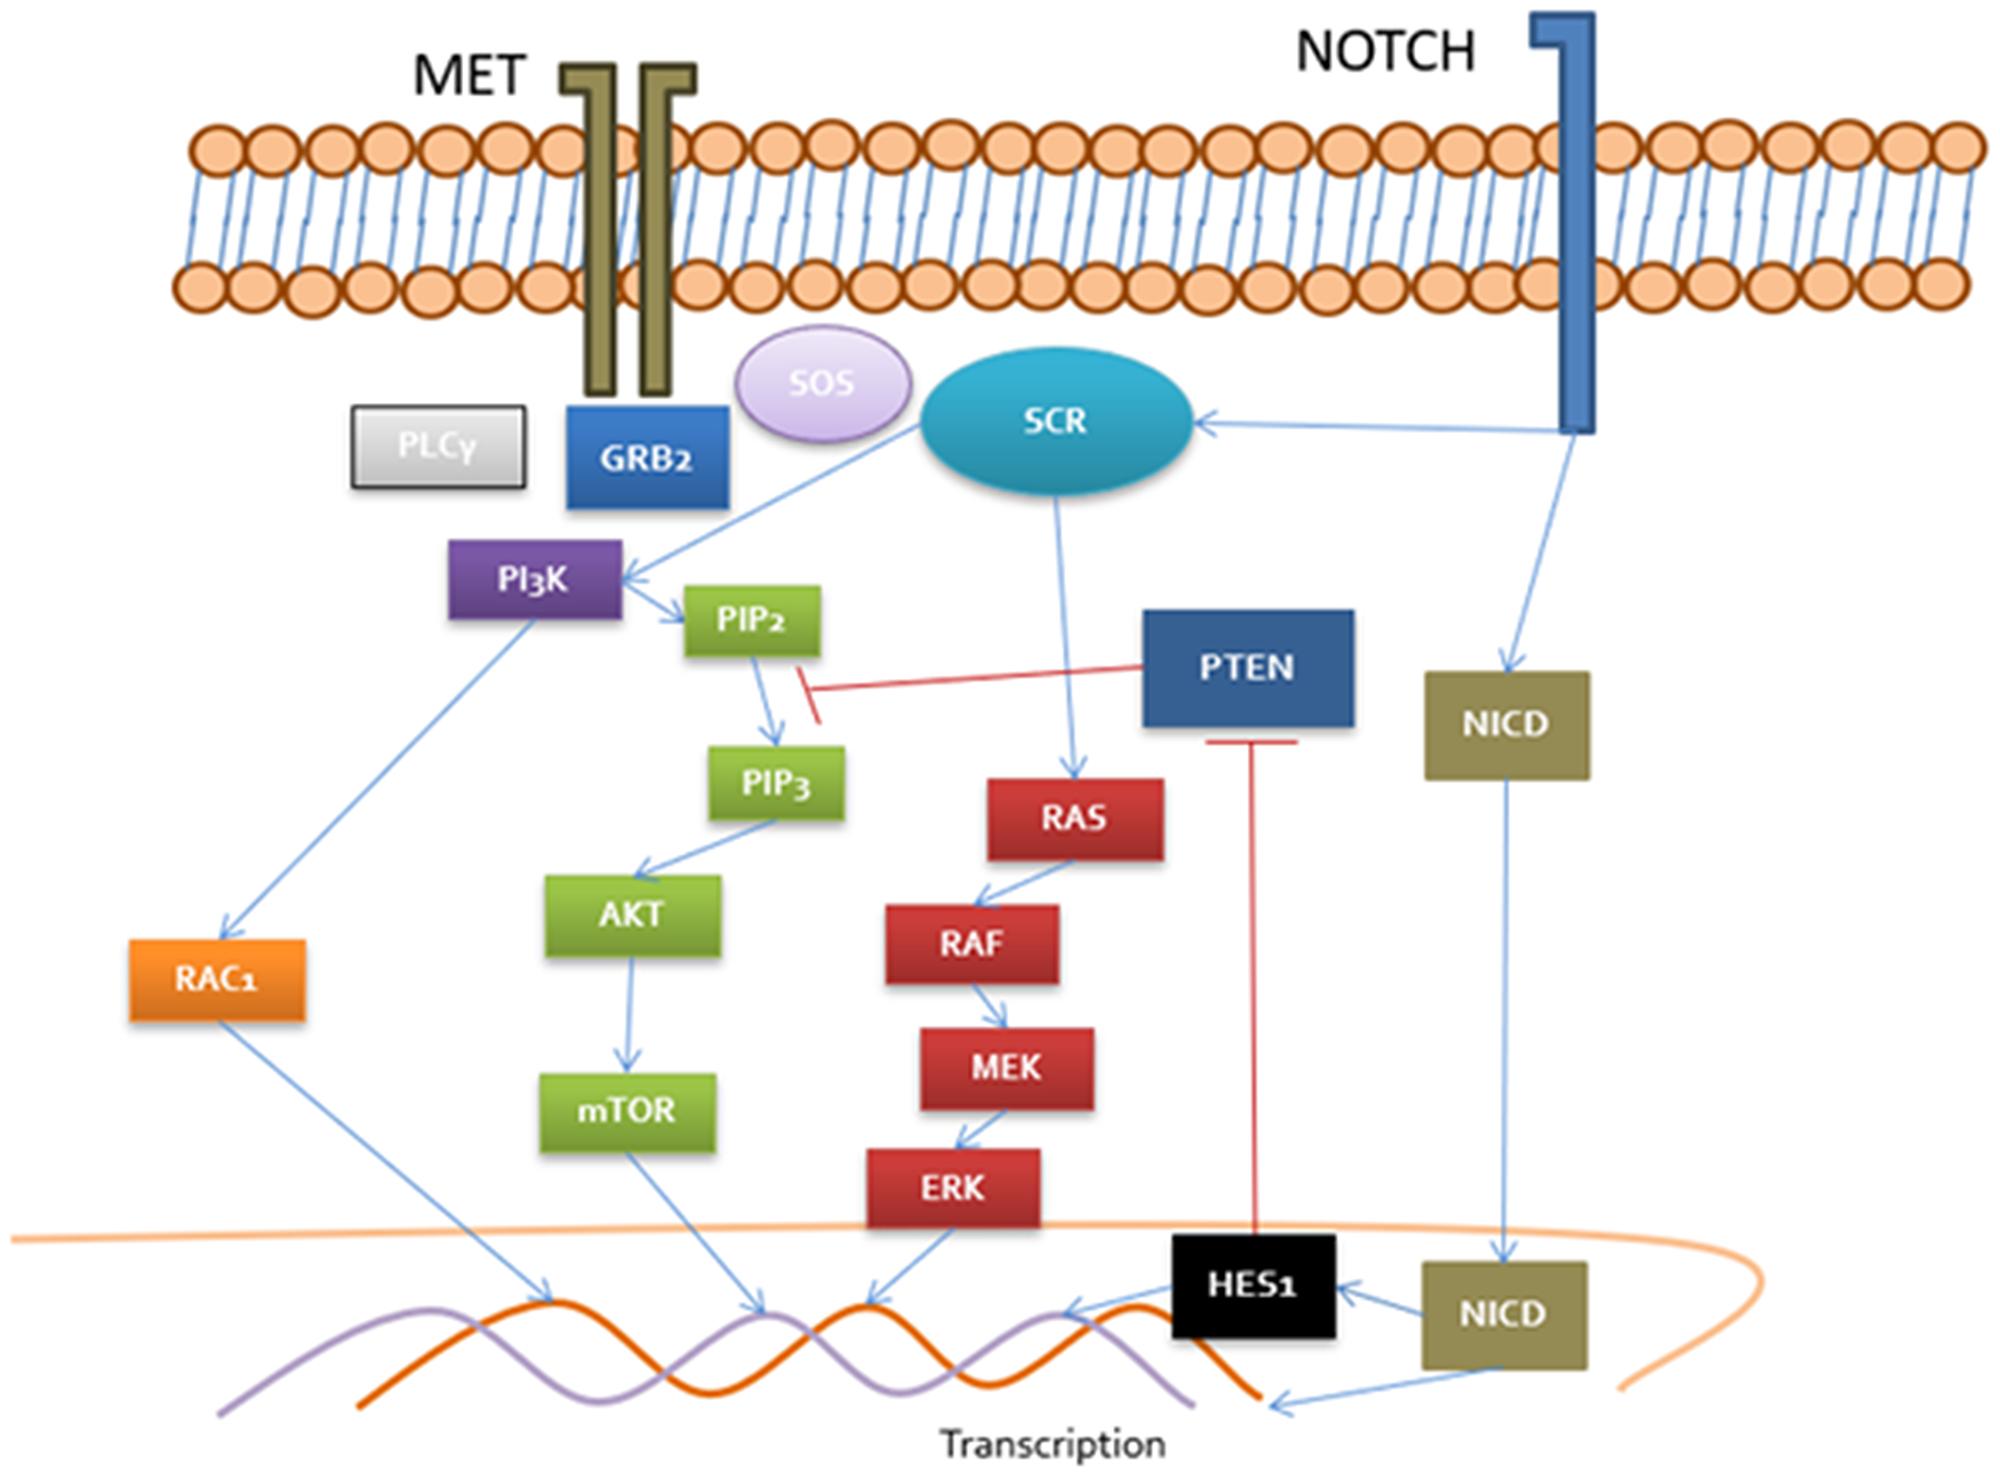 Cross-talk between MET/NOTCH pathways MET recruit PLCγ, GRB2 and SOS which activate DAG receptors (PKC), RAS/RAF/MEK, PI3K/RAC and Akt/mTOR.